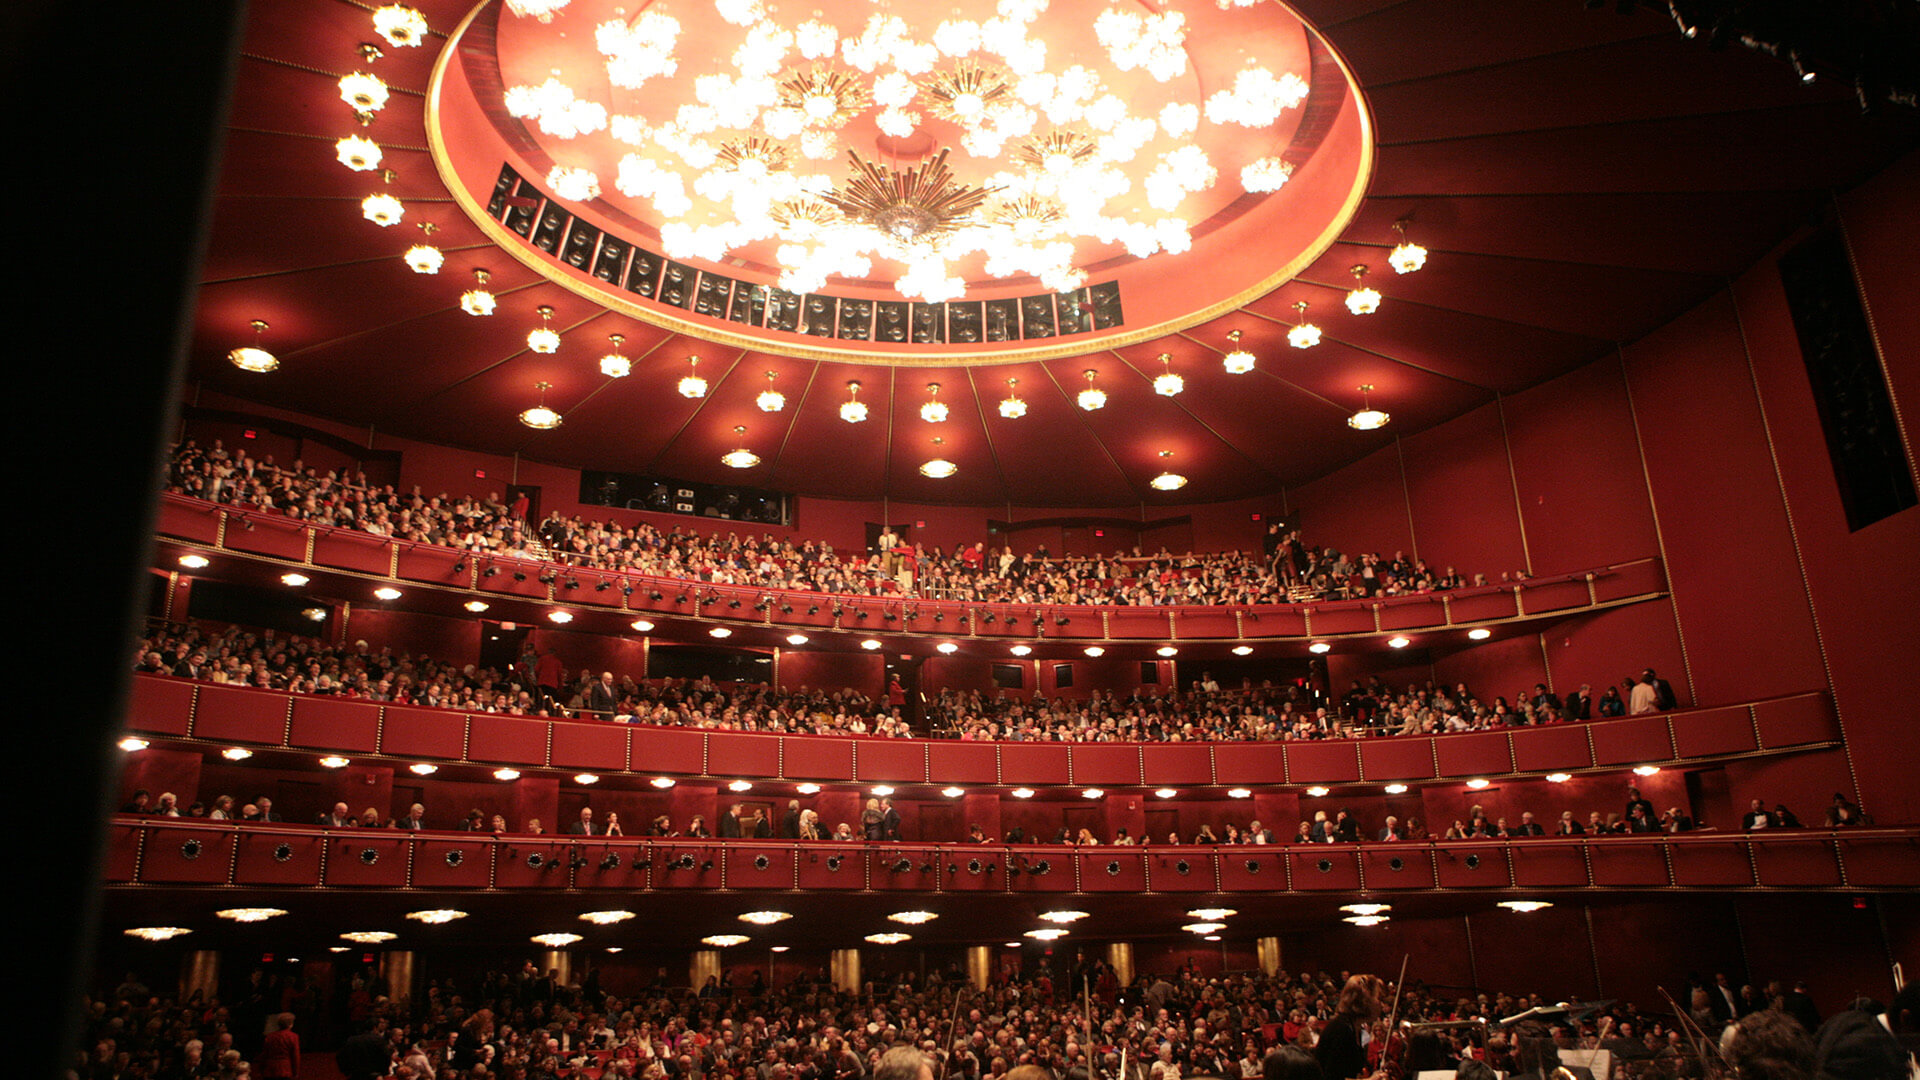 Petite Messe Solennelle, Kennedy Center Opera House Washington